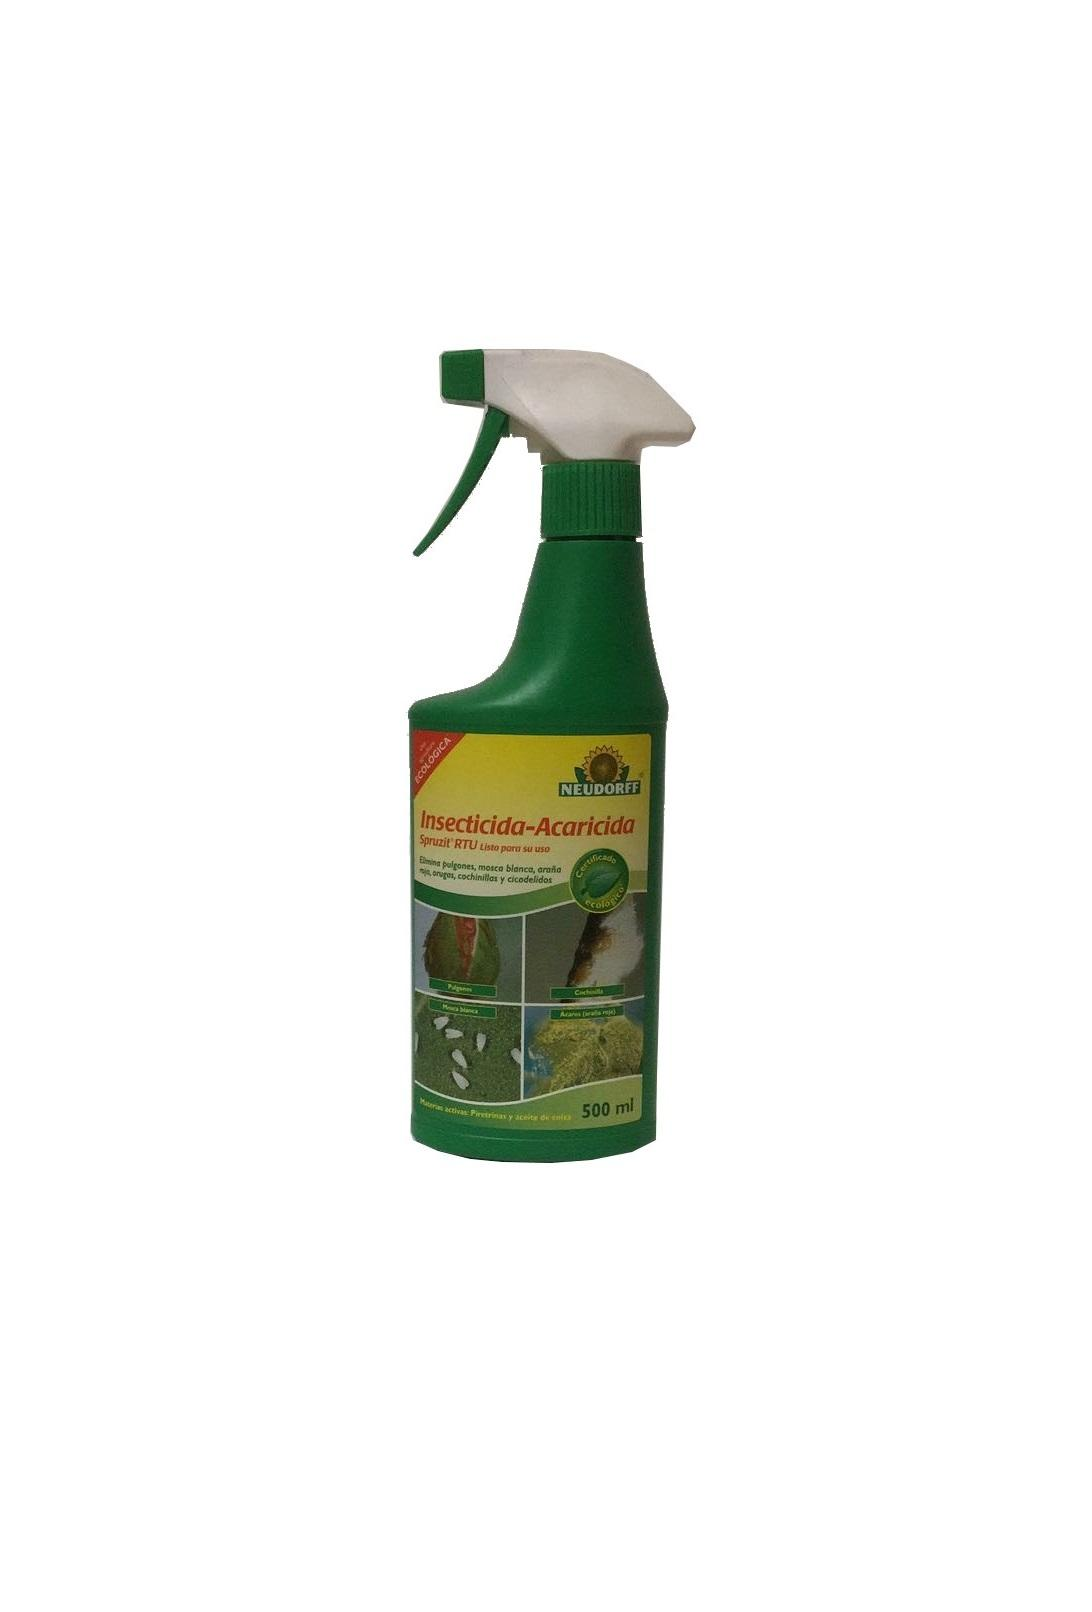 Insecticida- Acaricida Spruzit RTU Neudorf Ecologico